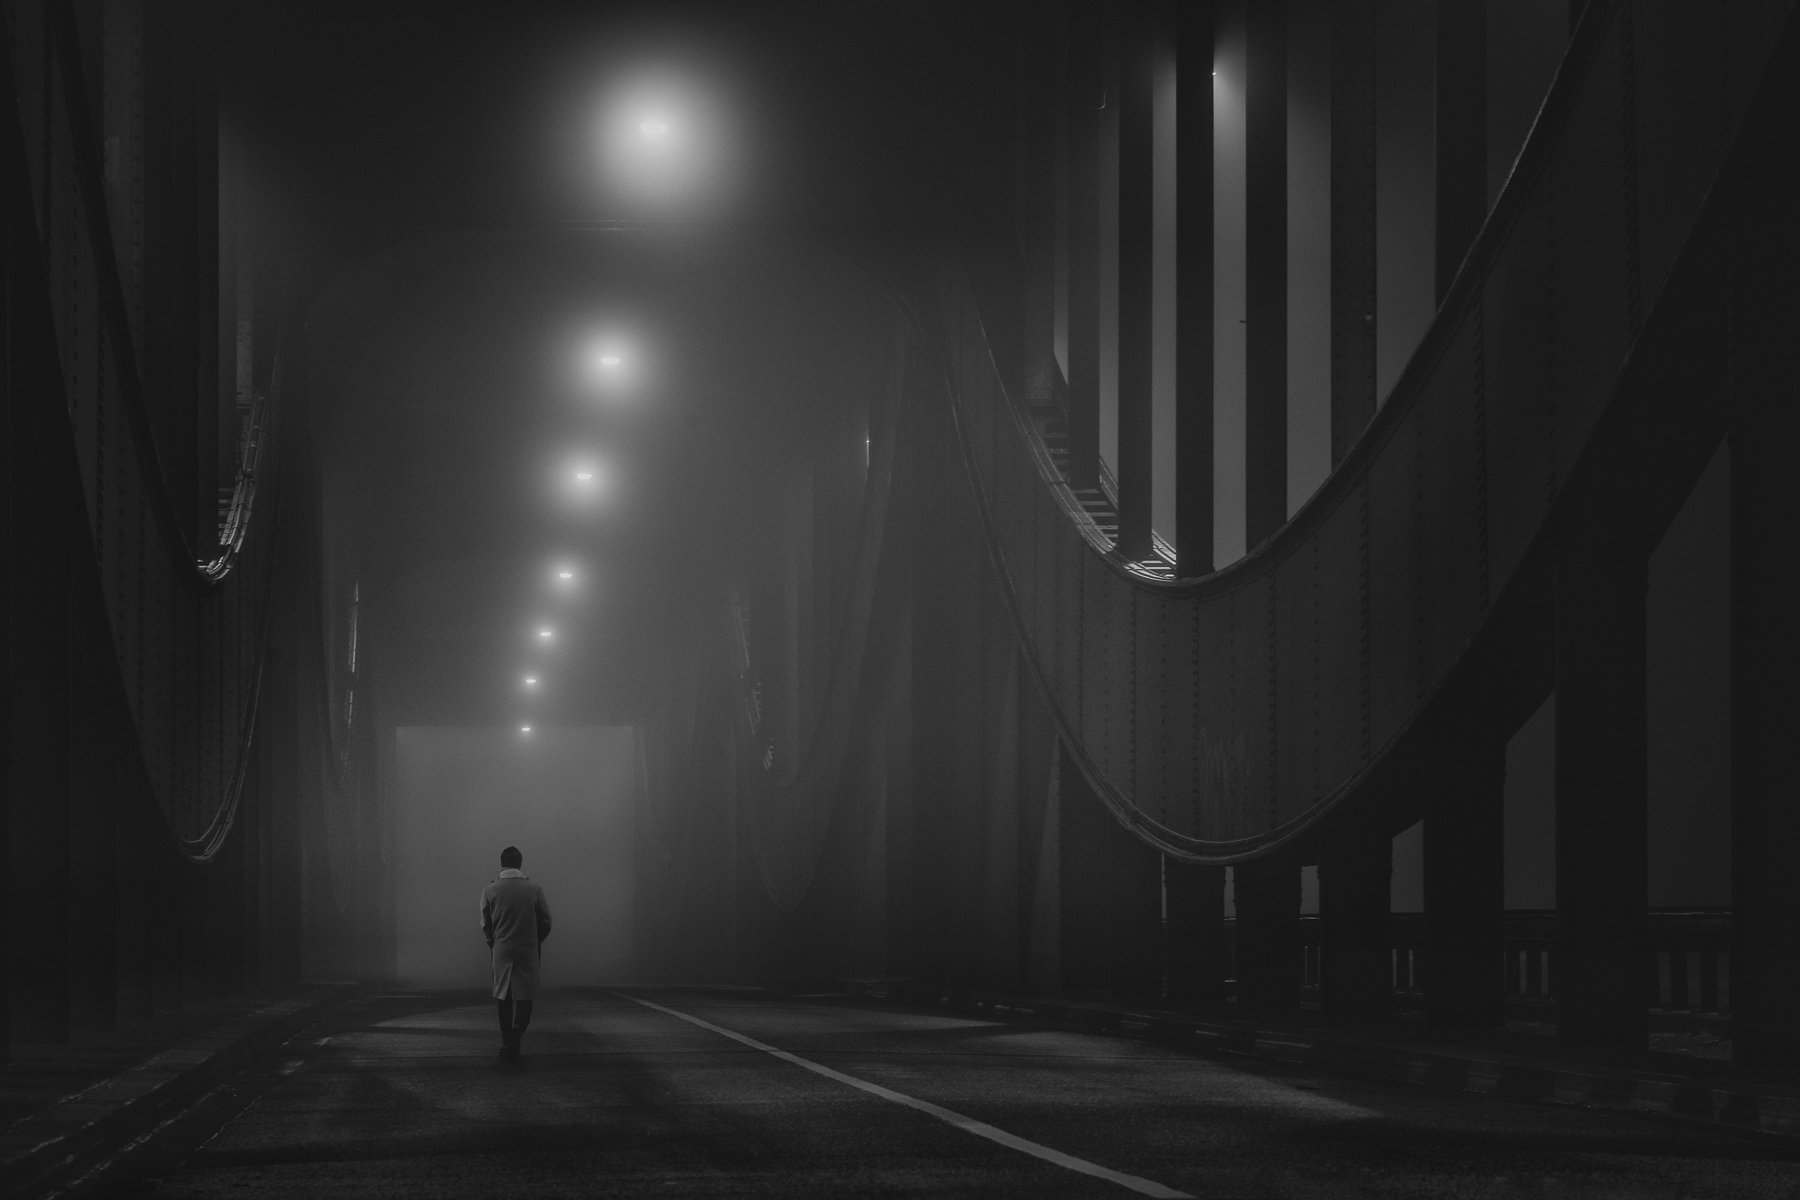 mood, lights, person, bridge, urban, street, Schönberg Alexander